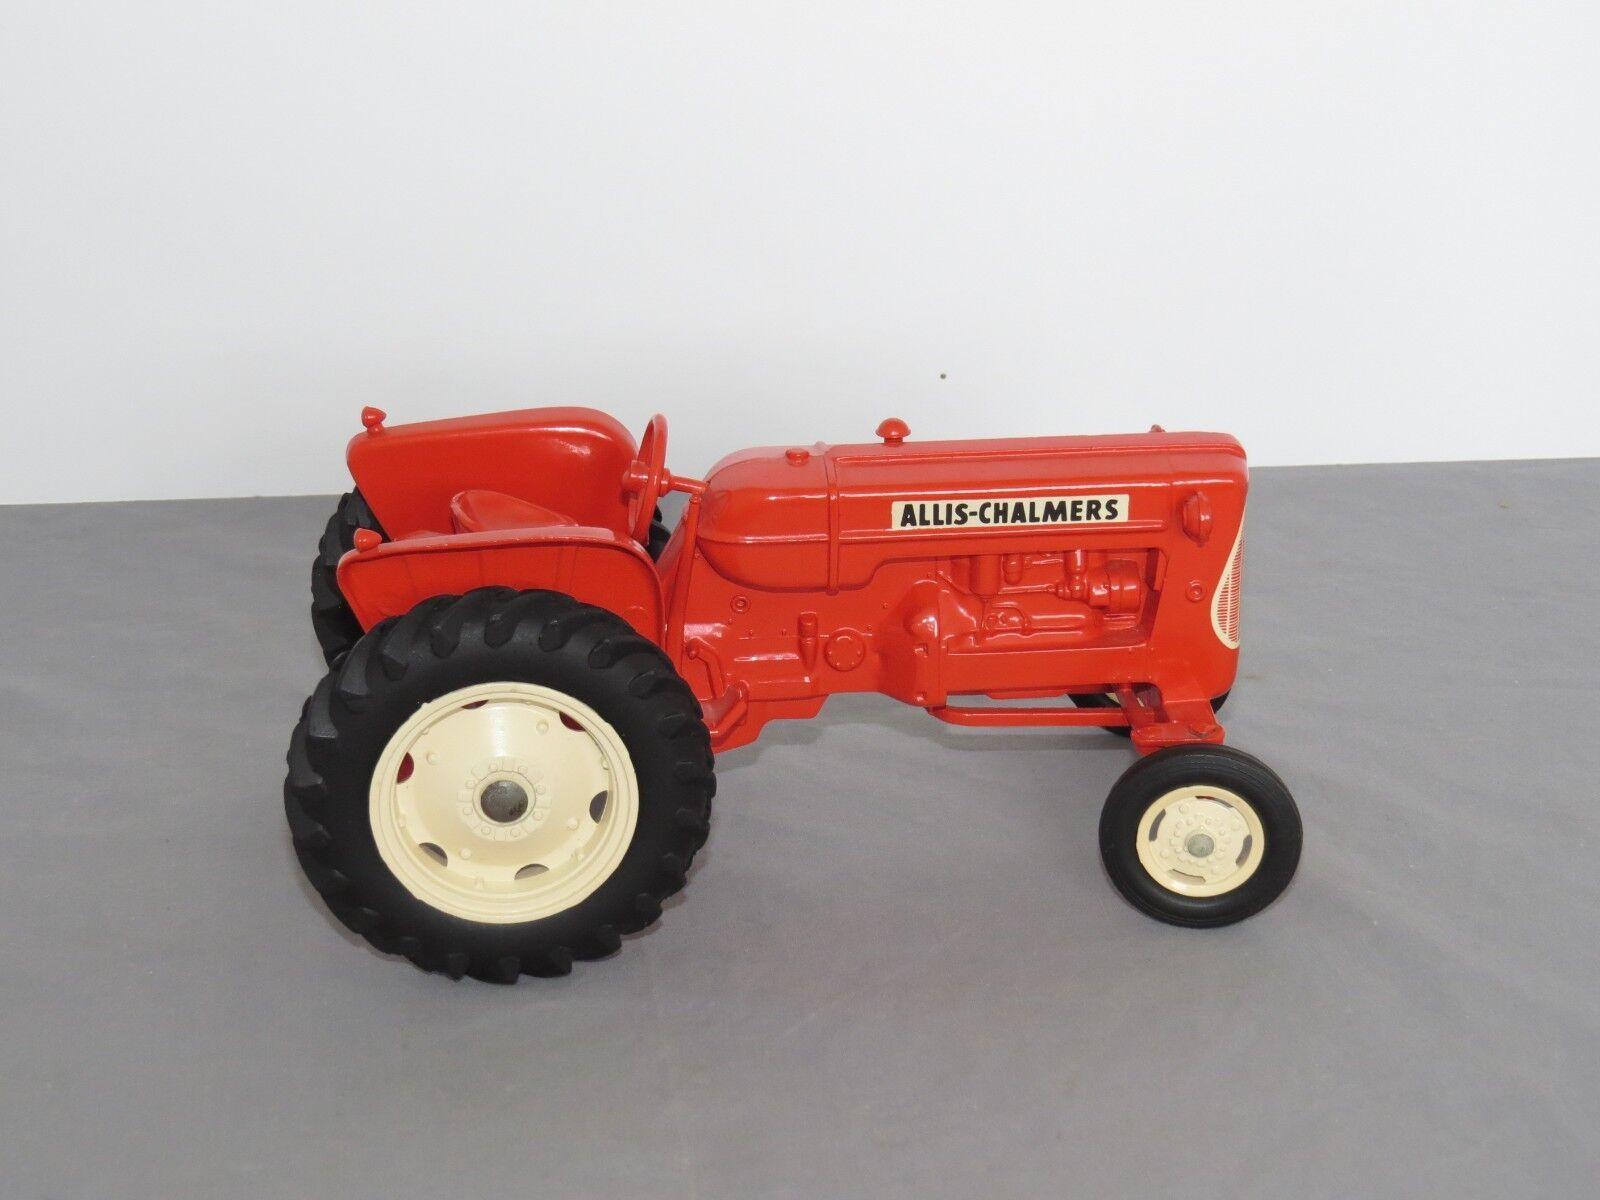 Vintage Allis Chalmers D17 D-17 ERTL ERTL ERTL 1960's Toy Tractor RESTORED NICE wide front 955c7b